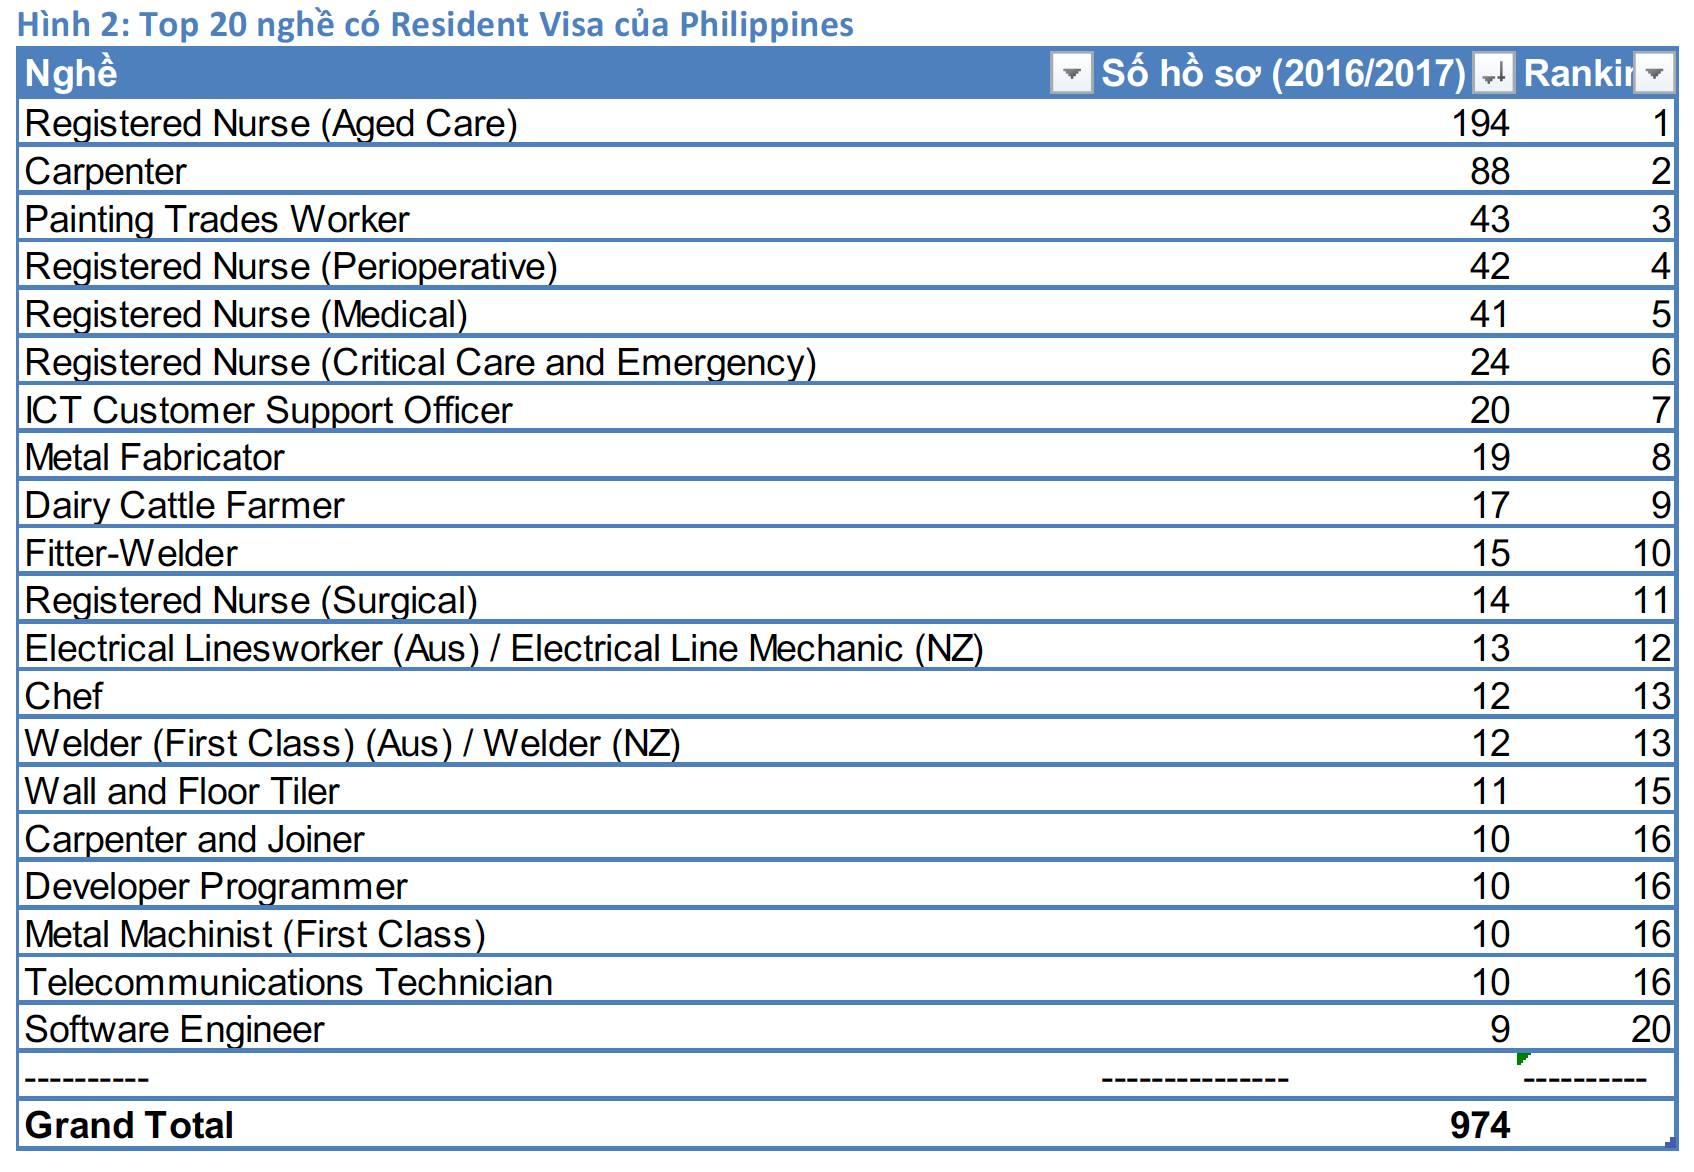 Resident Visa Philippines-top 20 jobs